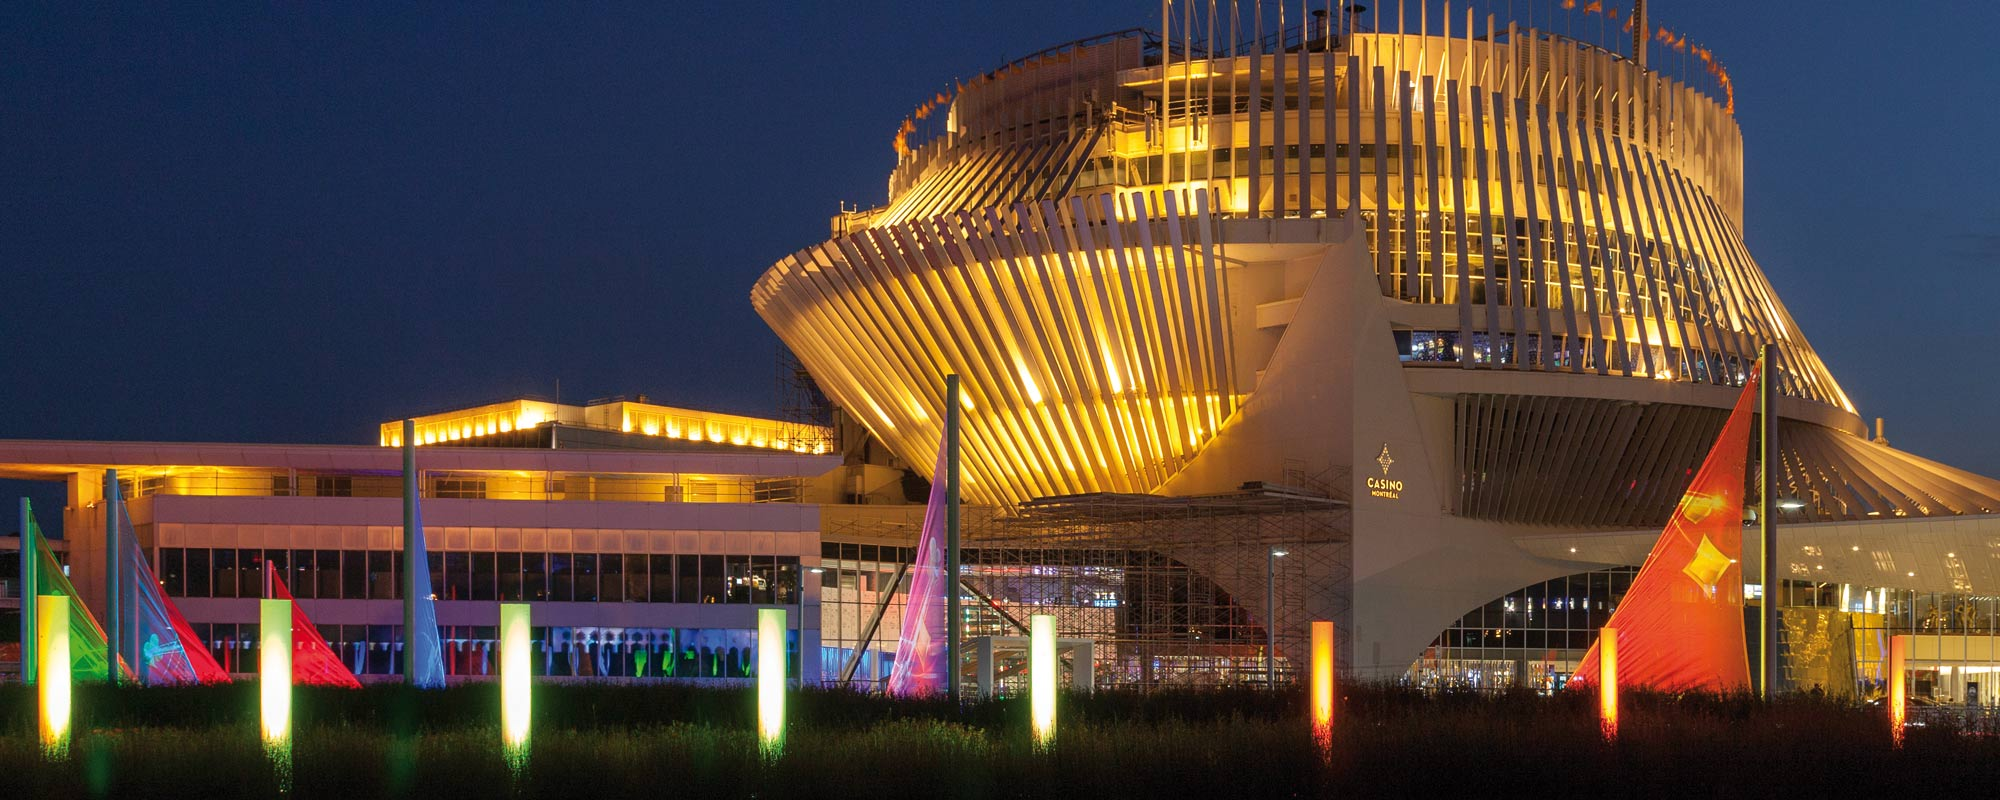 D_Montreal_Casino